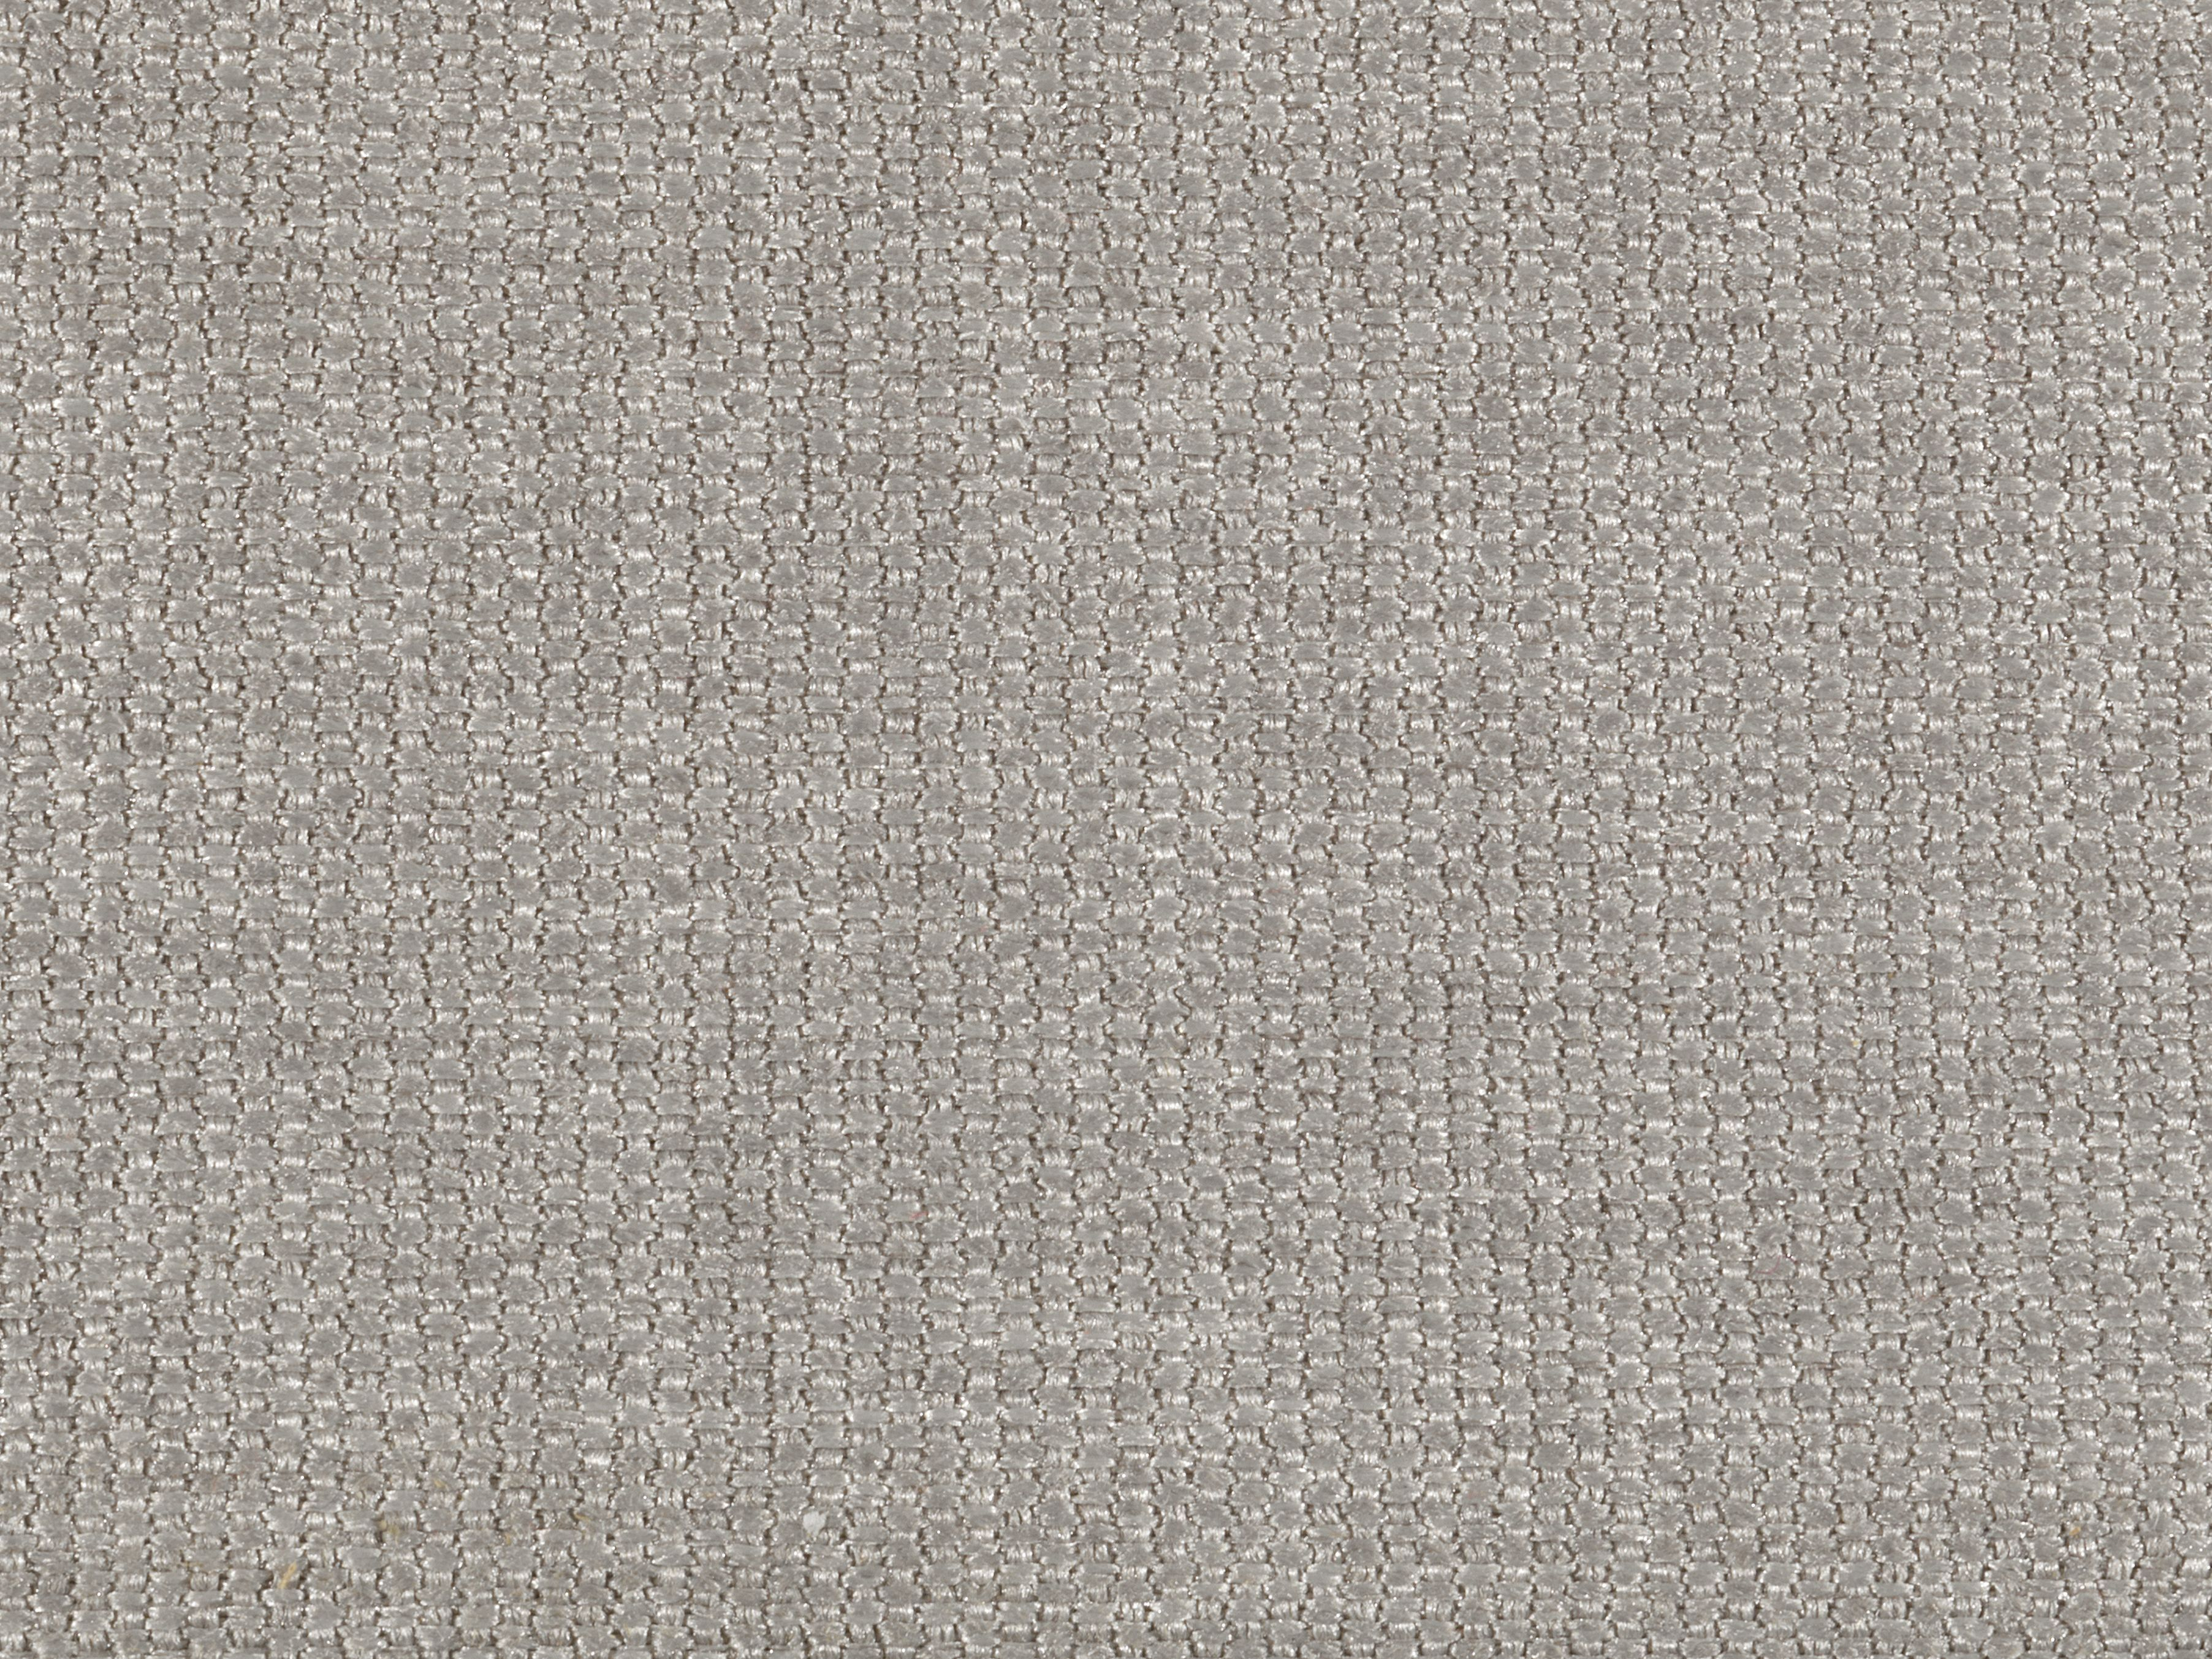 Tessuto color grigio chiaro  I tessuti dei divani ...